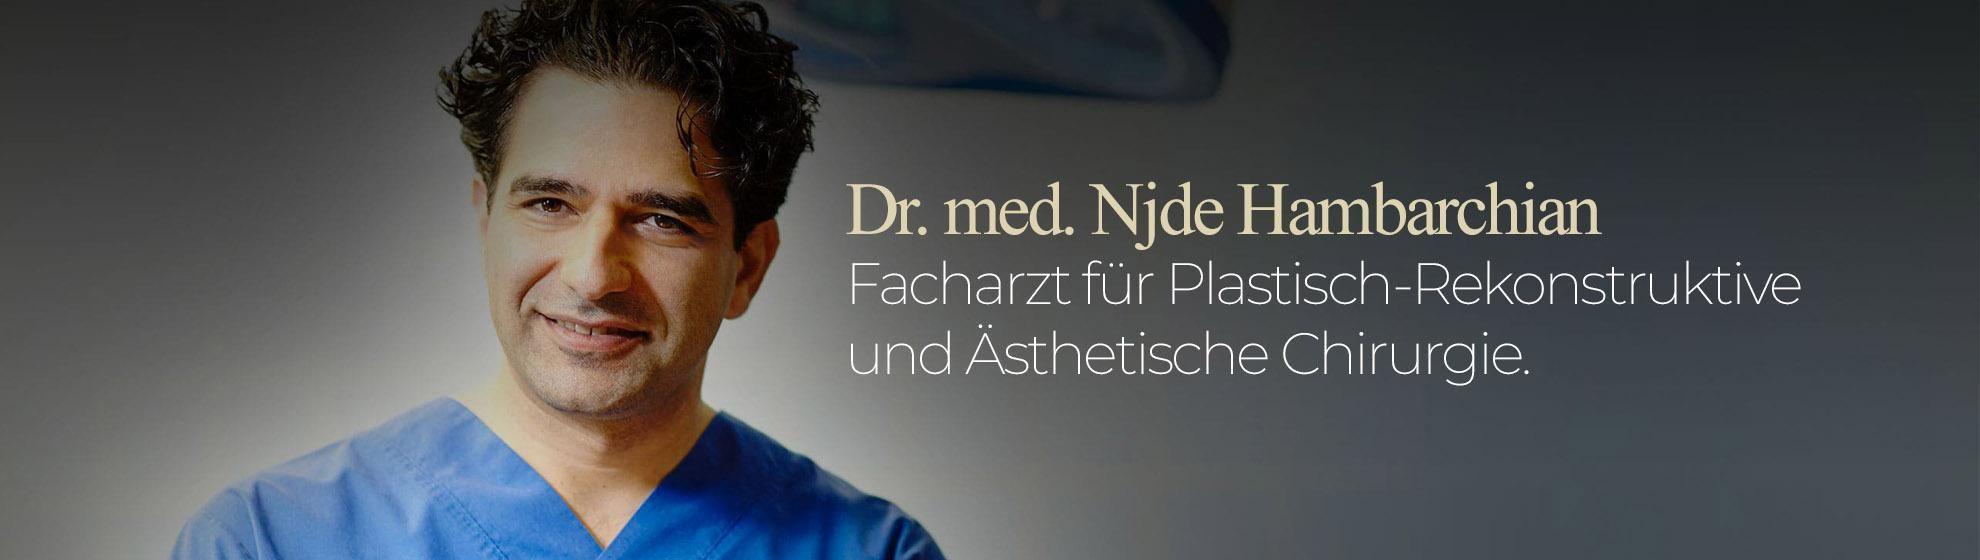 Dr. med. Njde Hambarchian